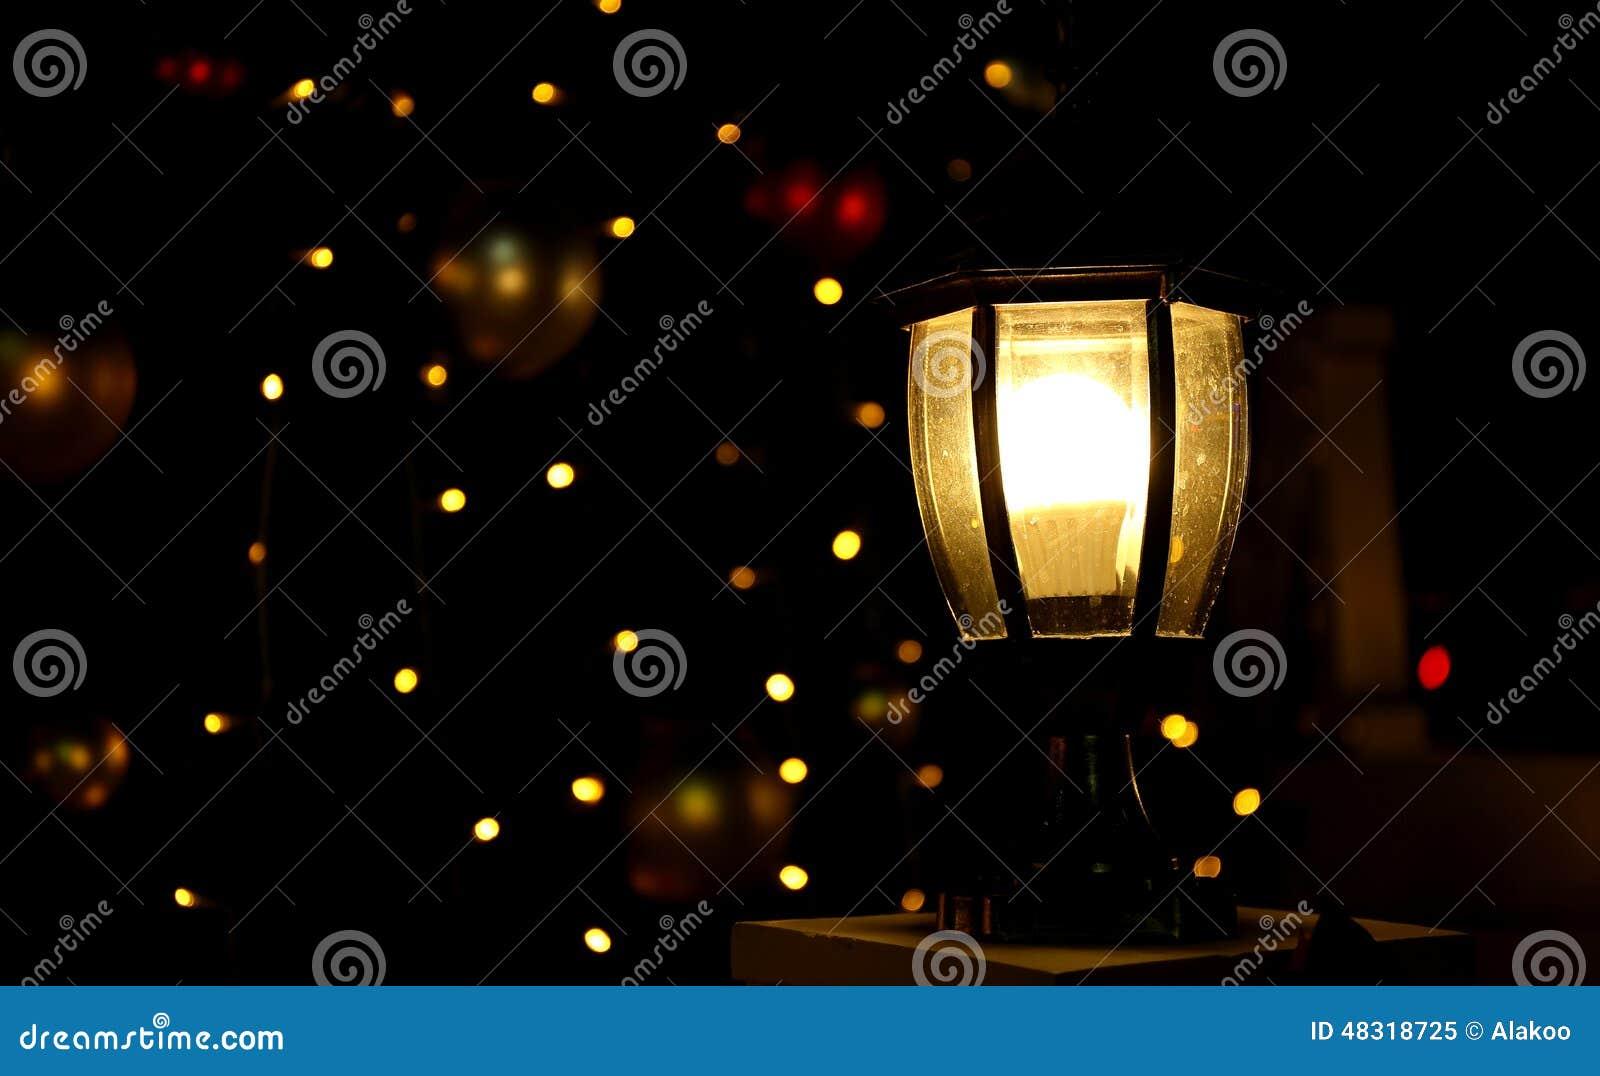 Christmas Tree Lights Light Background Stock Photo Image